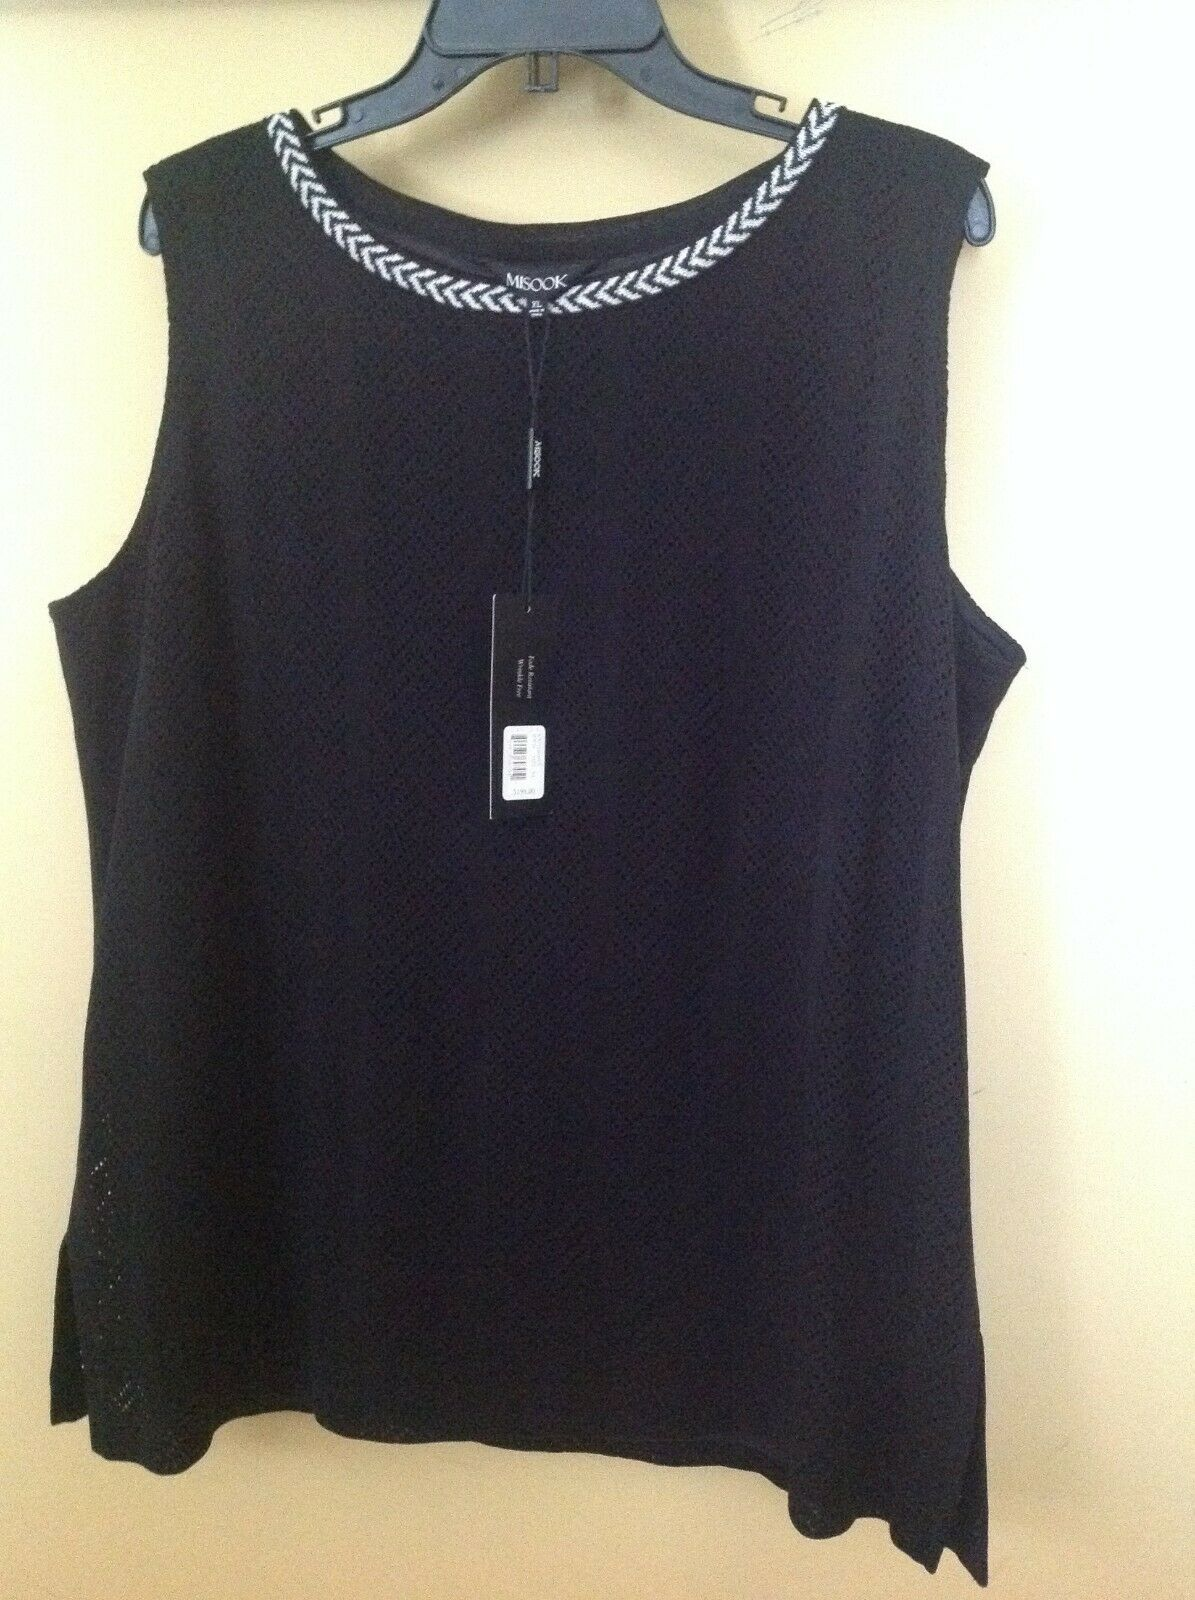 Misook schwarz Weiß Bordure Chevron Pointelle herringbhone Knit Tank Shell Top M, XL